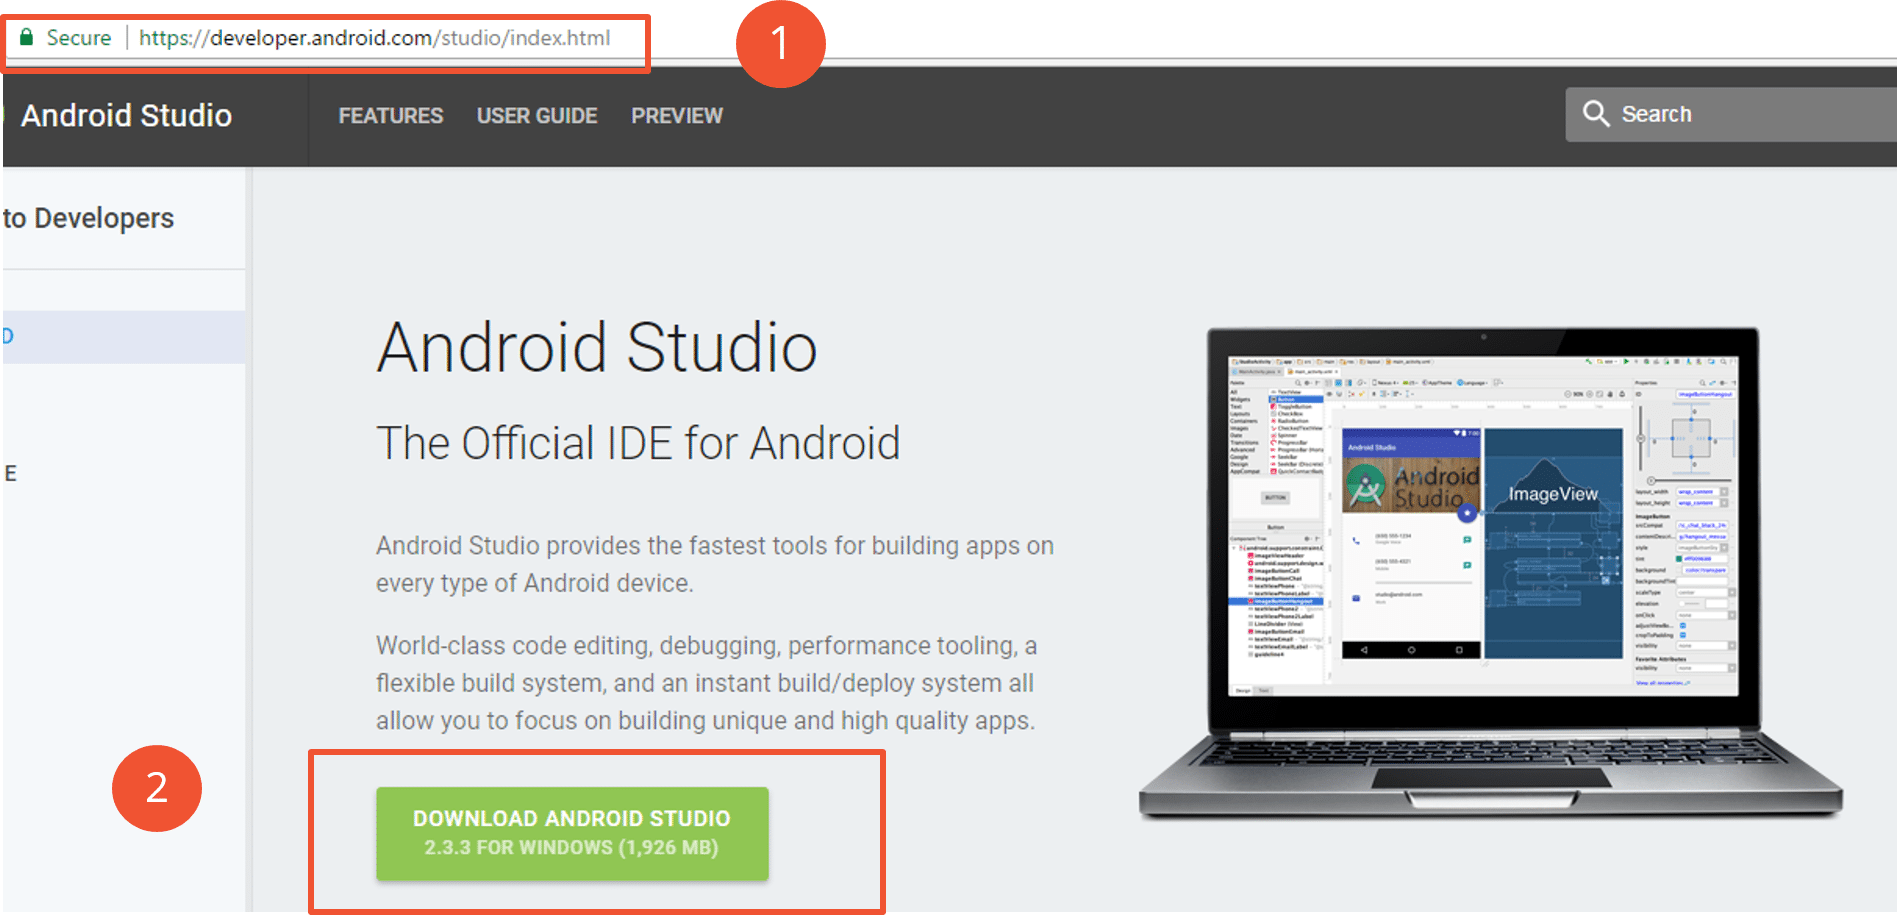 Installing Android Studio